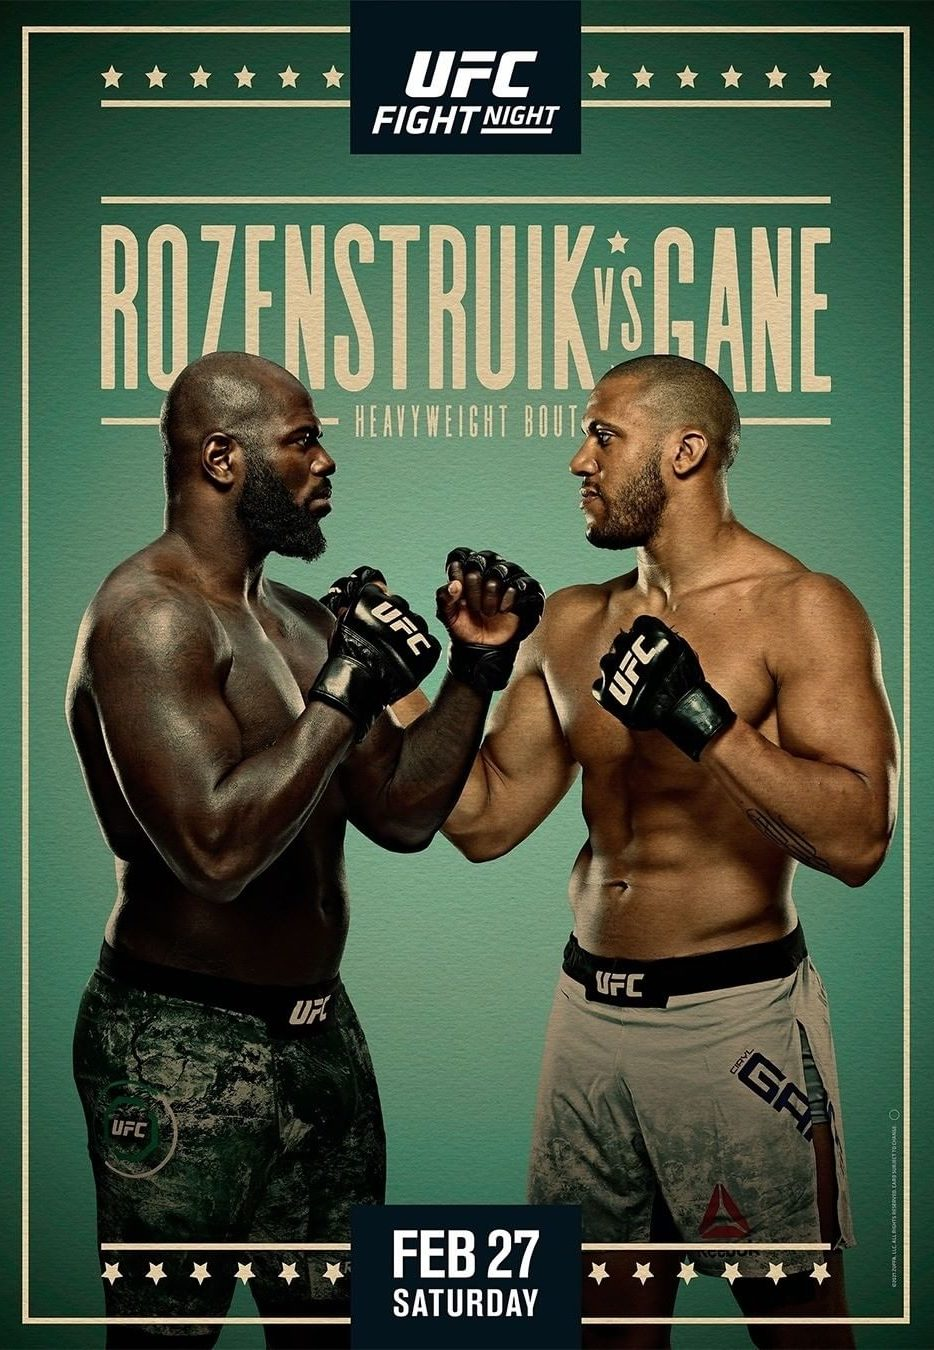 UFC Fight Night - Rozenstruik vs Gane